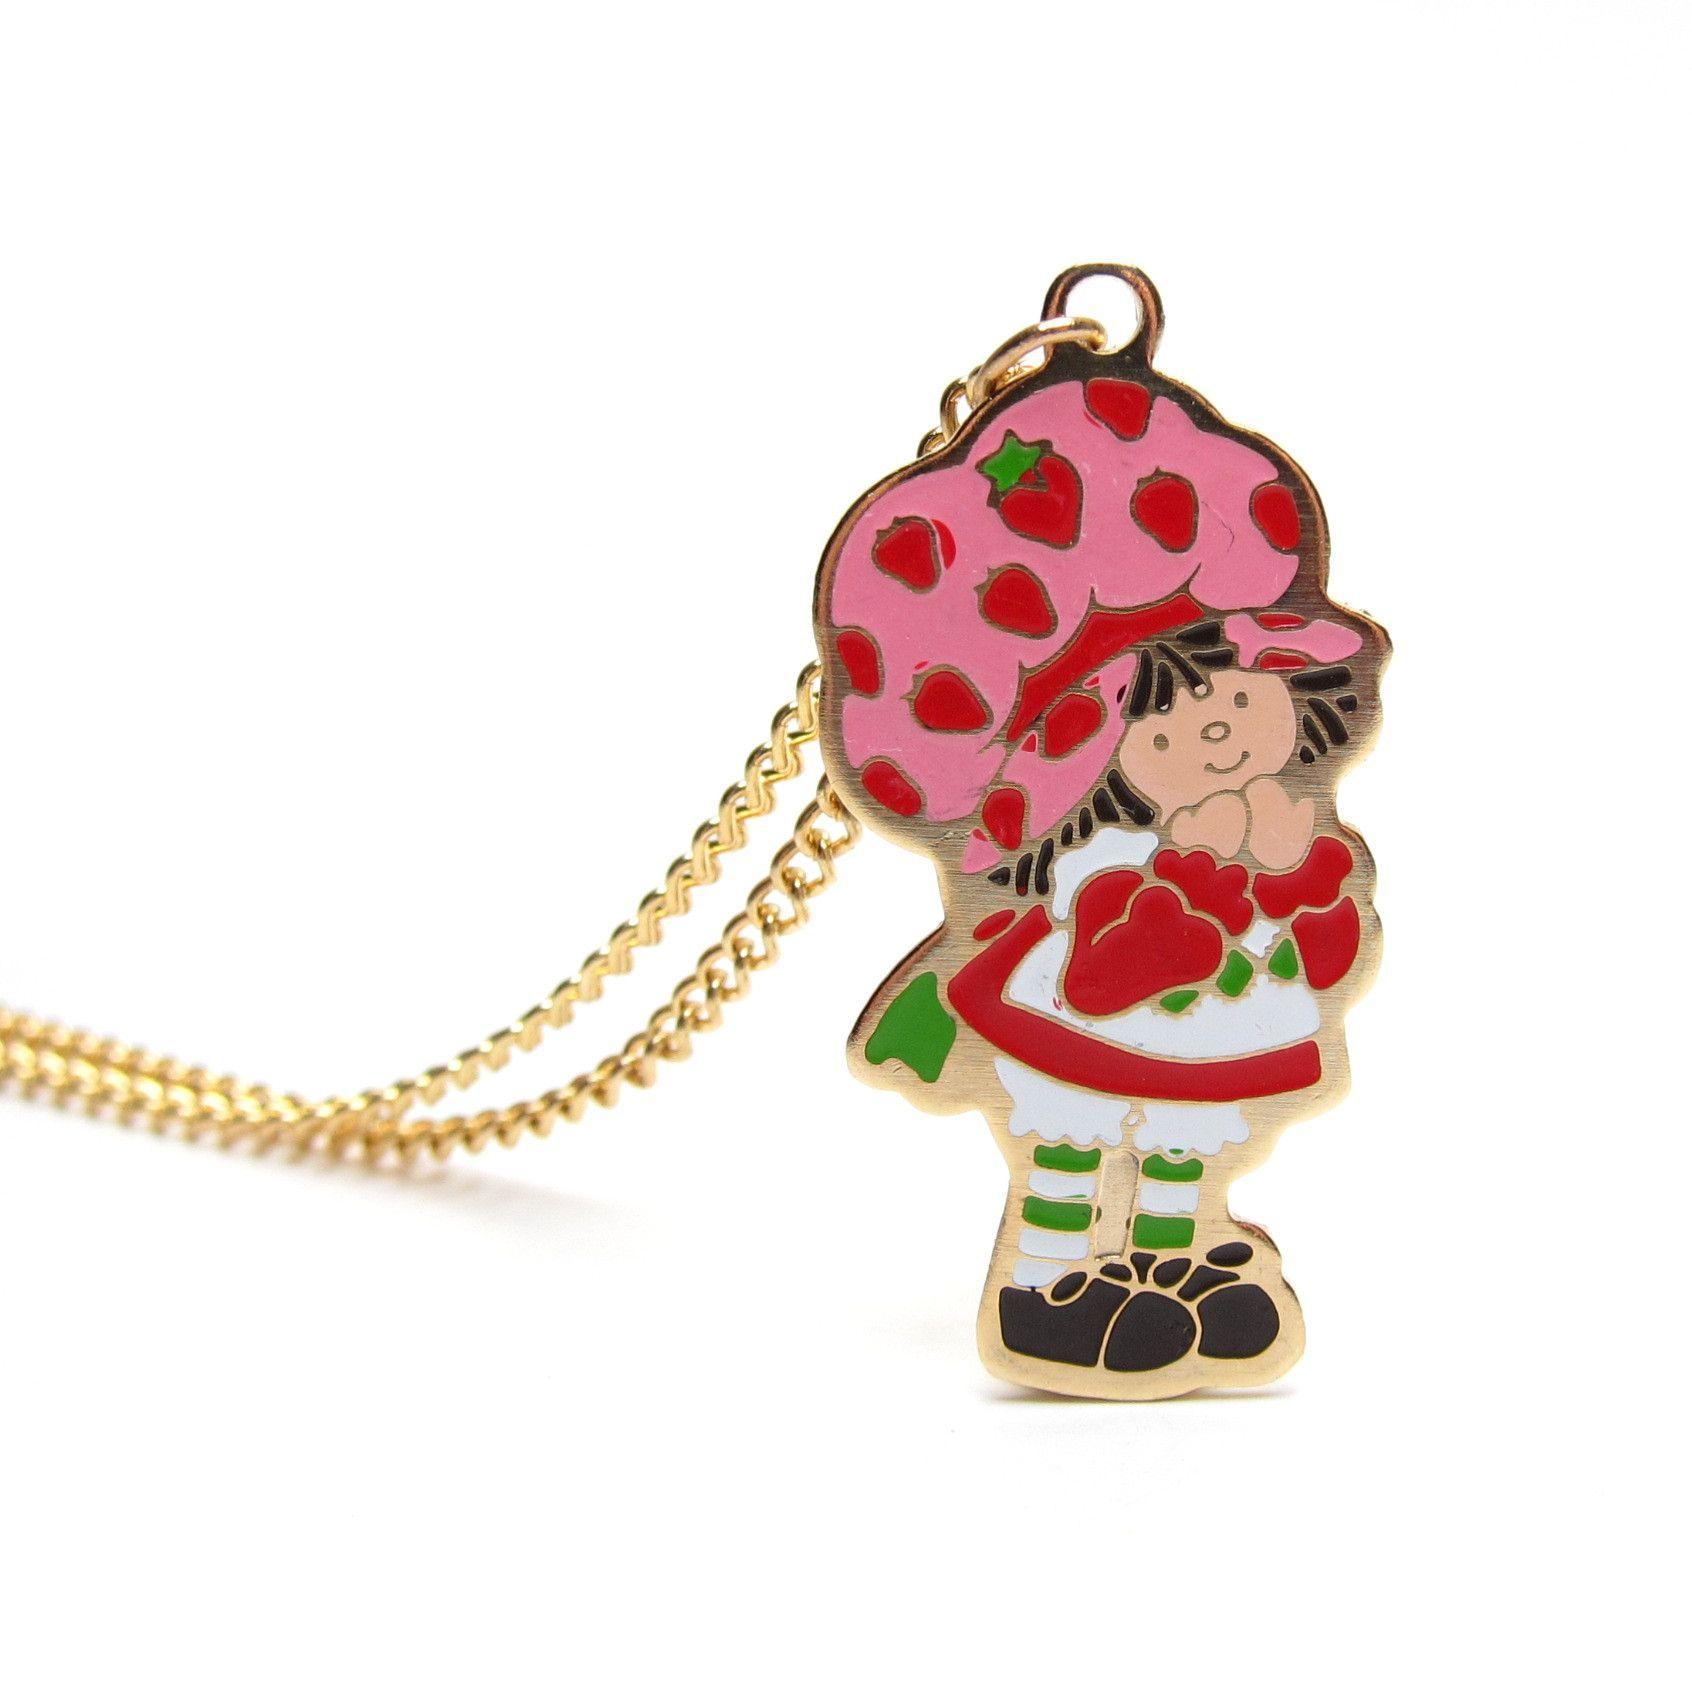 Strawberry Shortcake Necklace Gold Enameled Charm On Chain